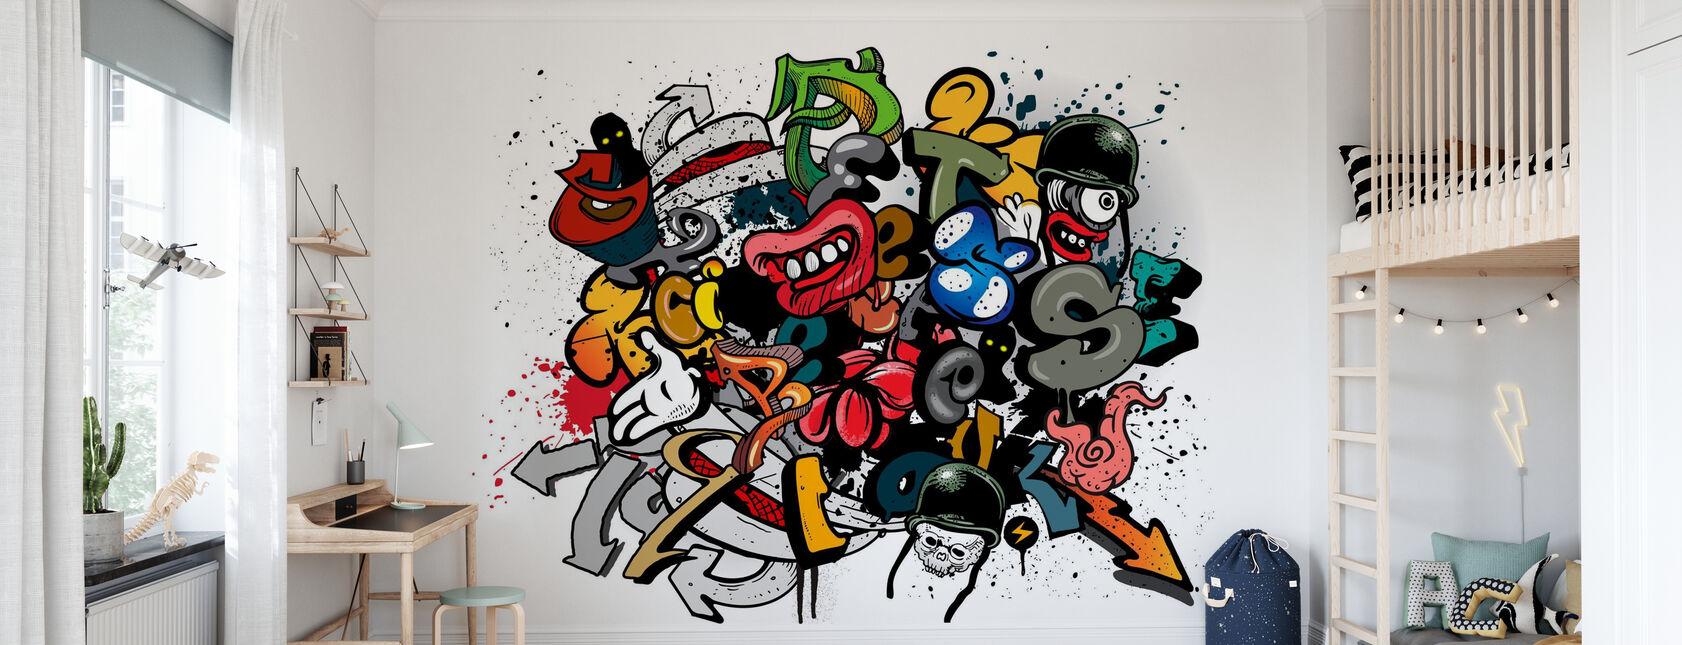 Graffiti-elementen - Behang - Kinderkamer